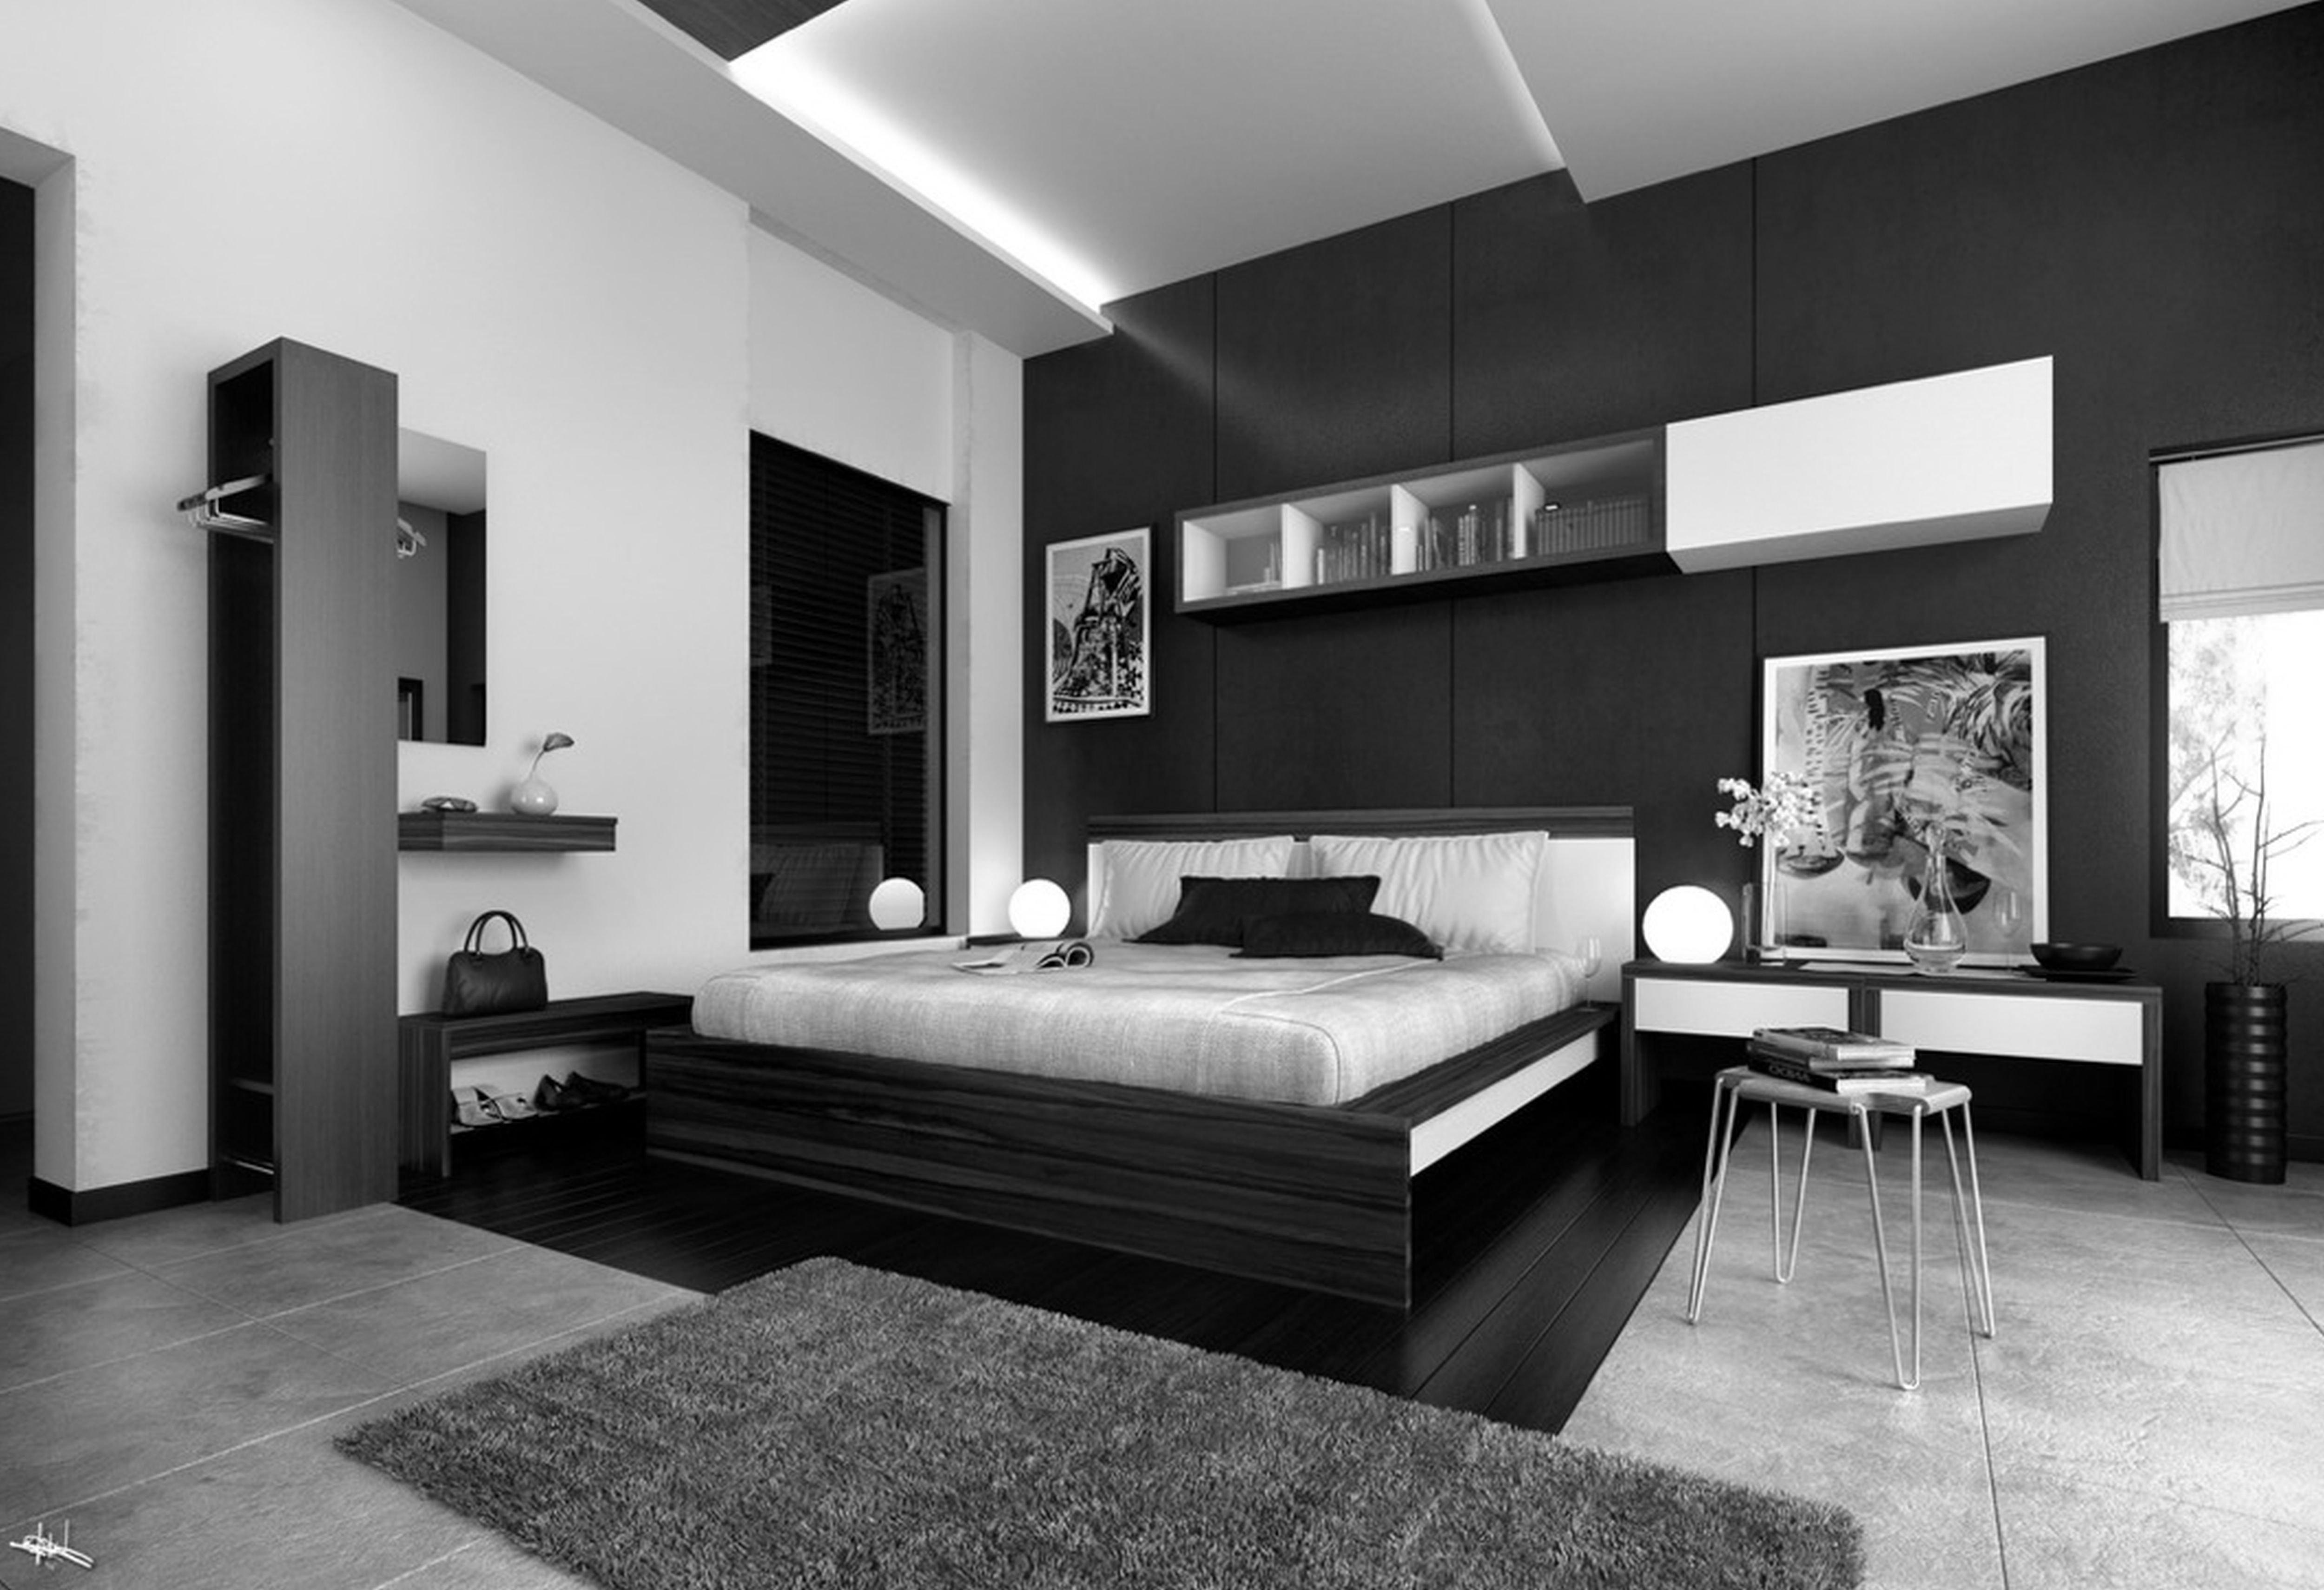 10 Wonderful Black And White Bedroom Ideas bedroom bedroom unusual vintage master black and white bedrooms 2020